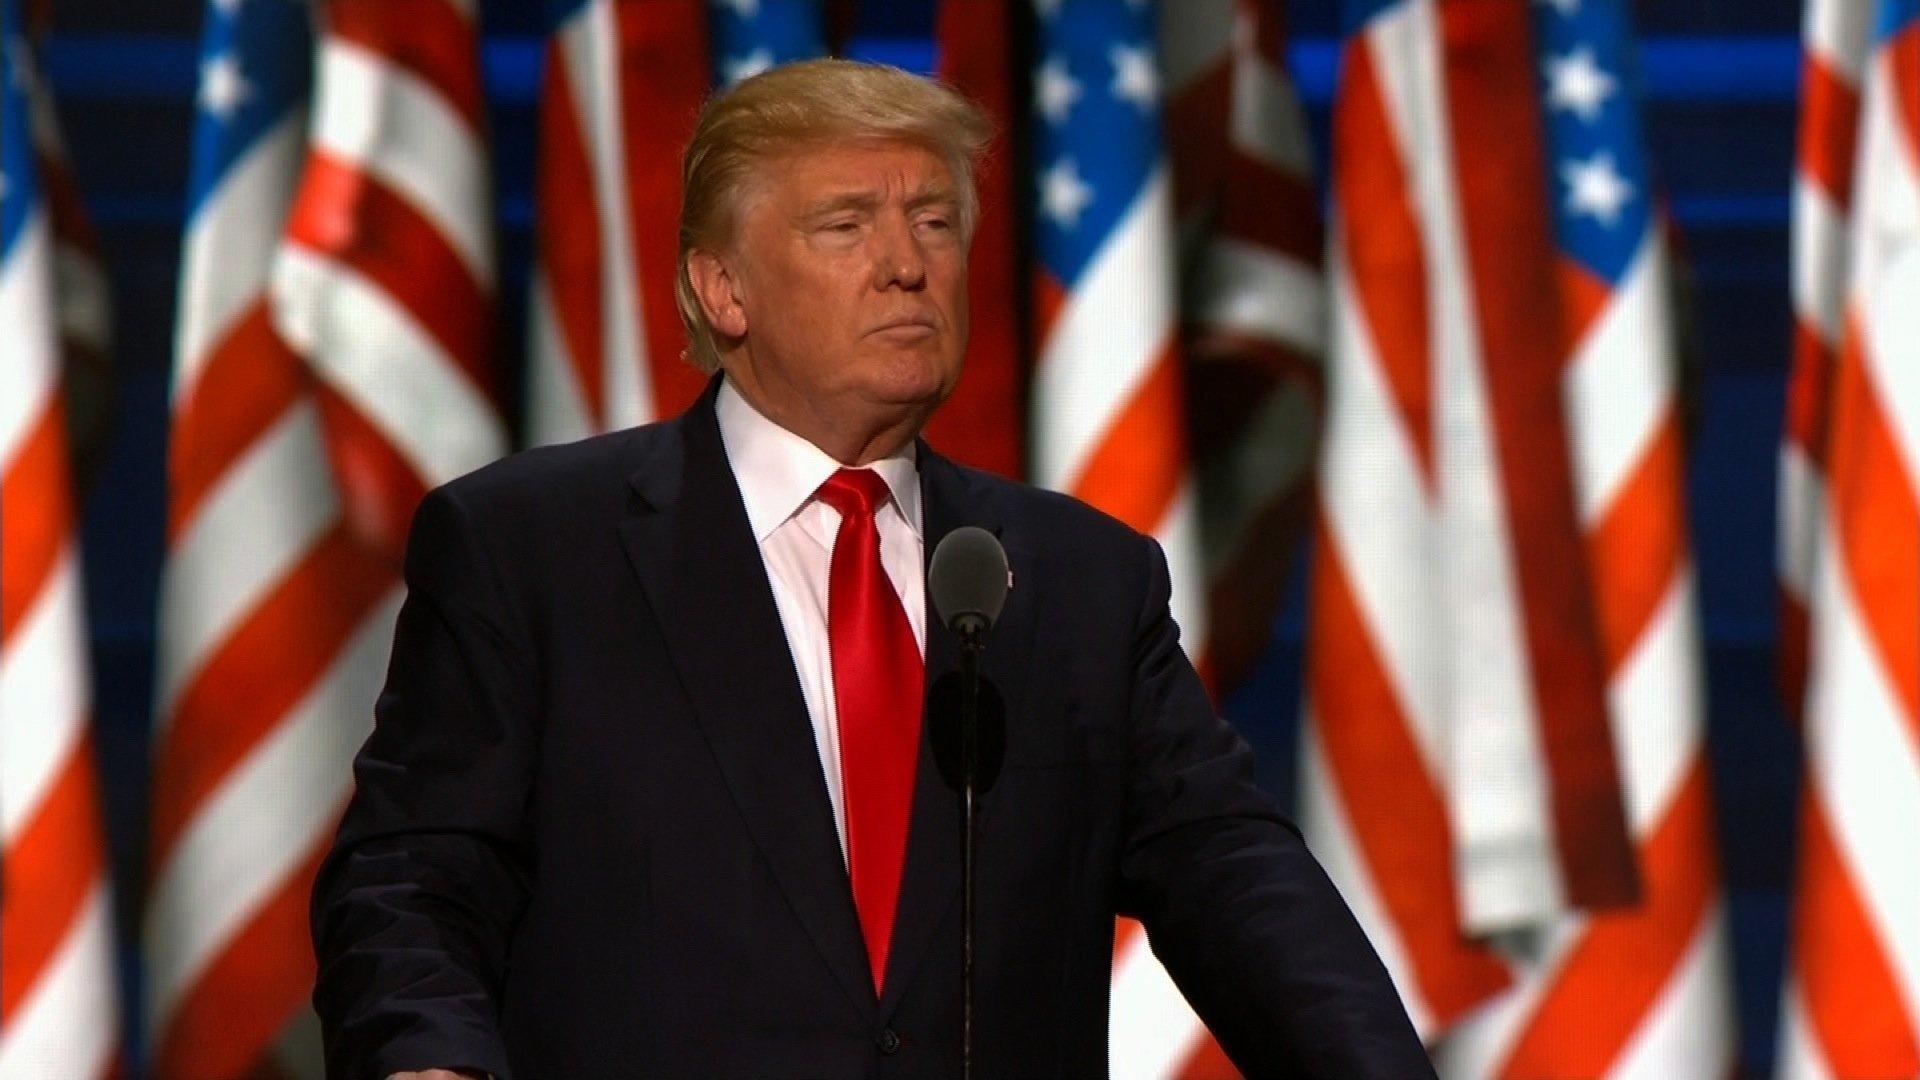 Melania Trump May Not Be First Lady